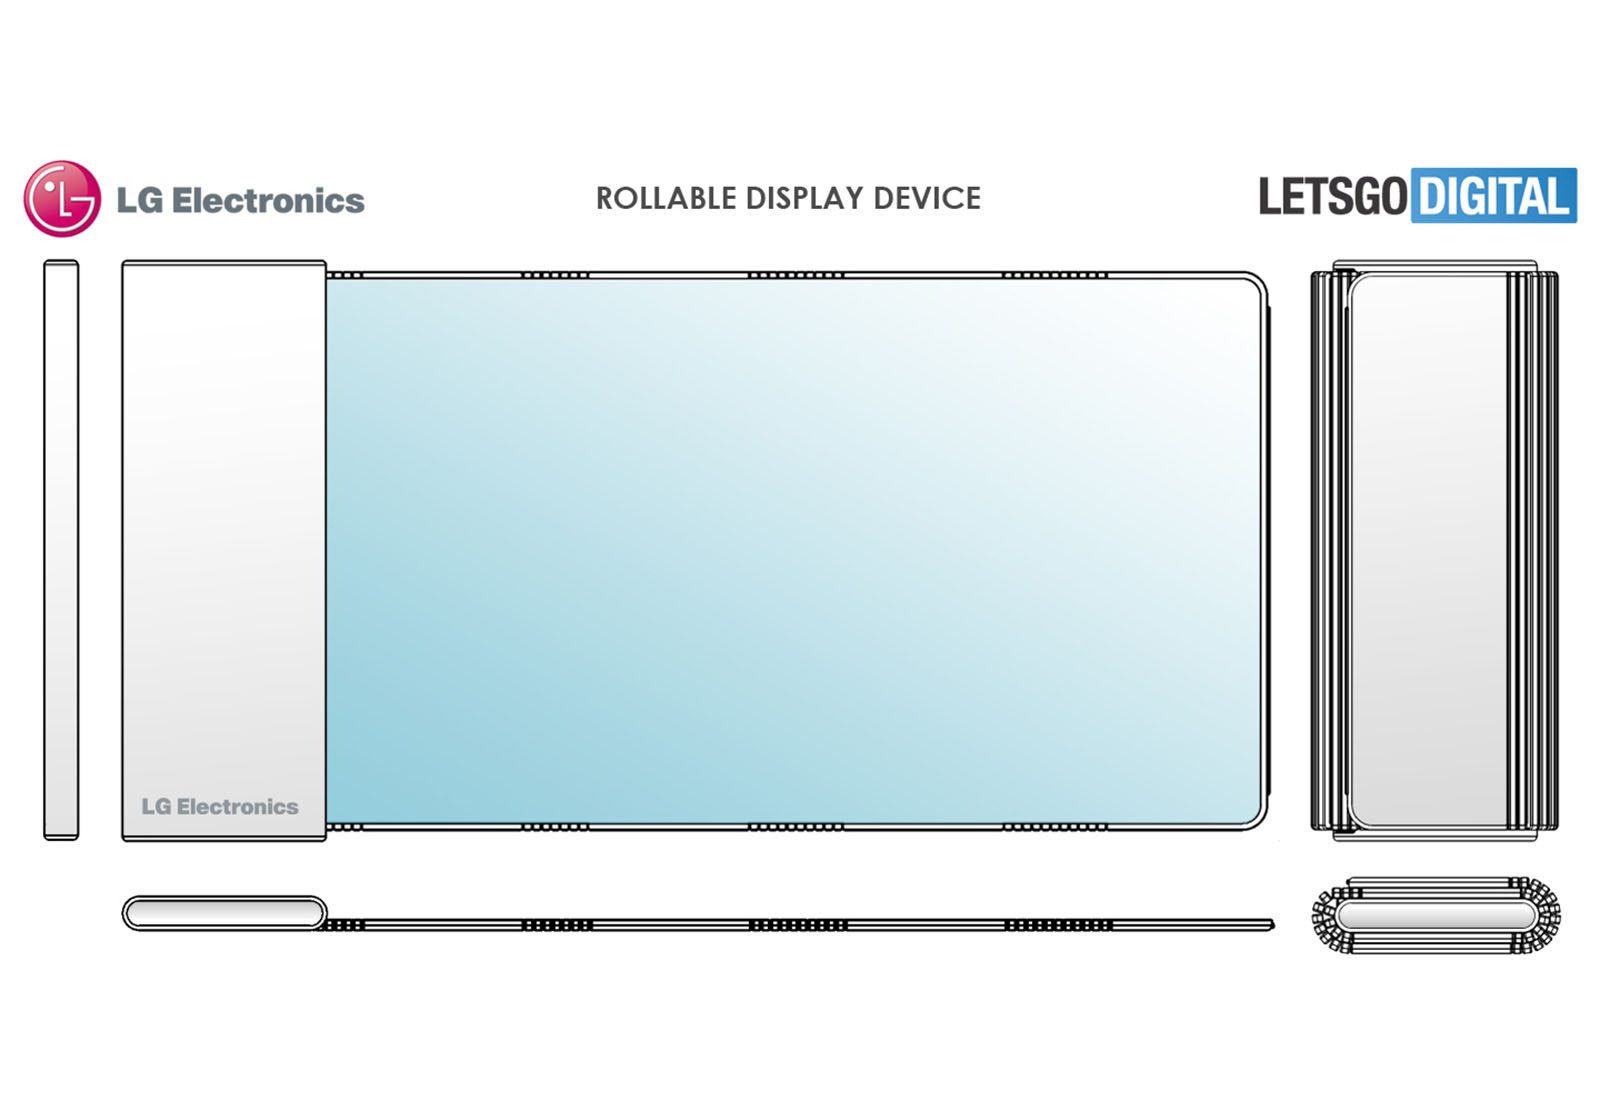 LG Foldablephone Patent